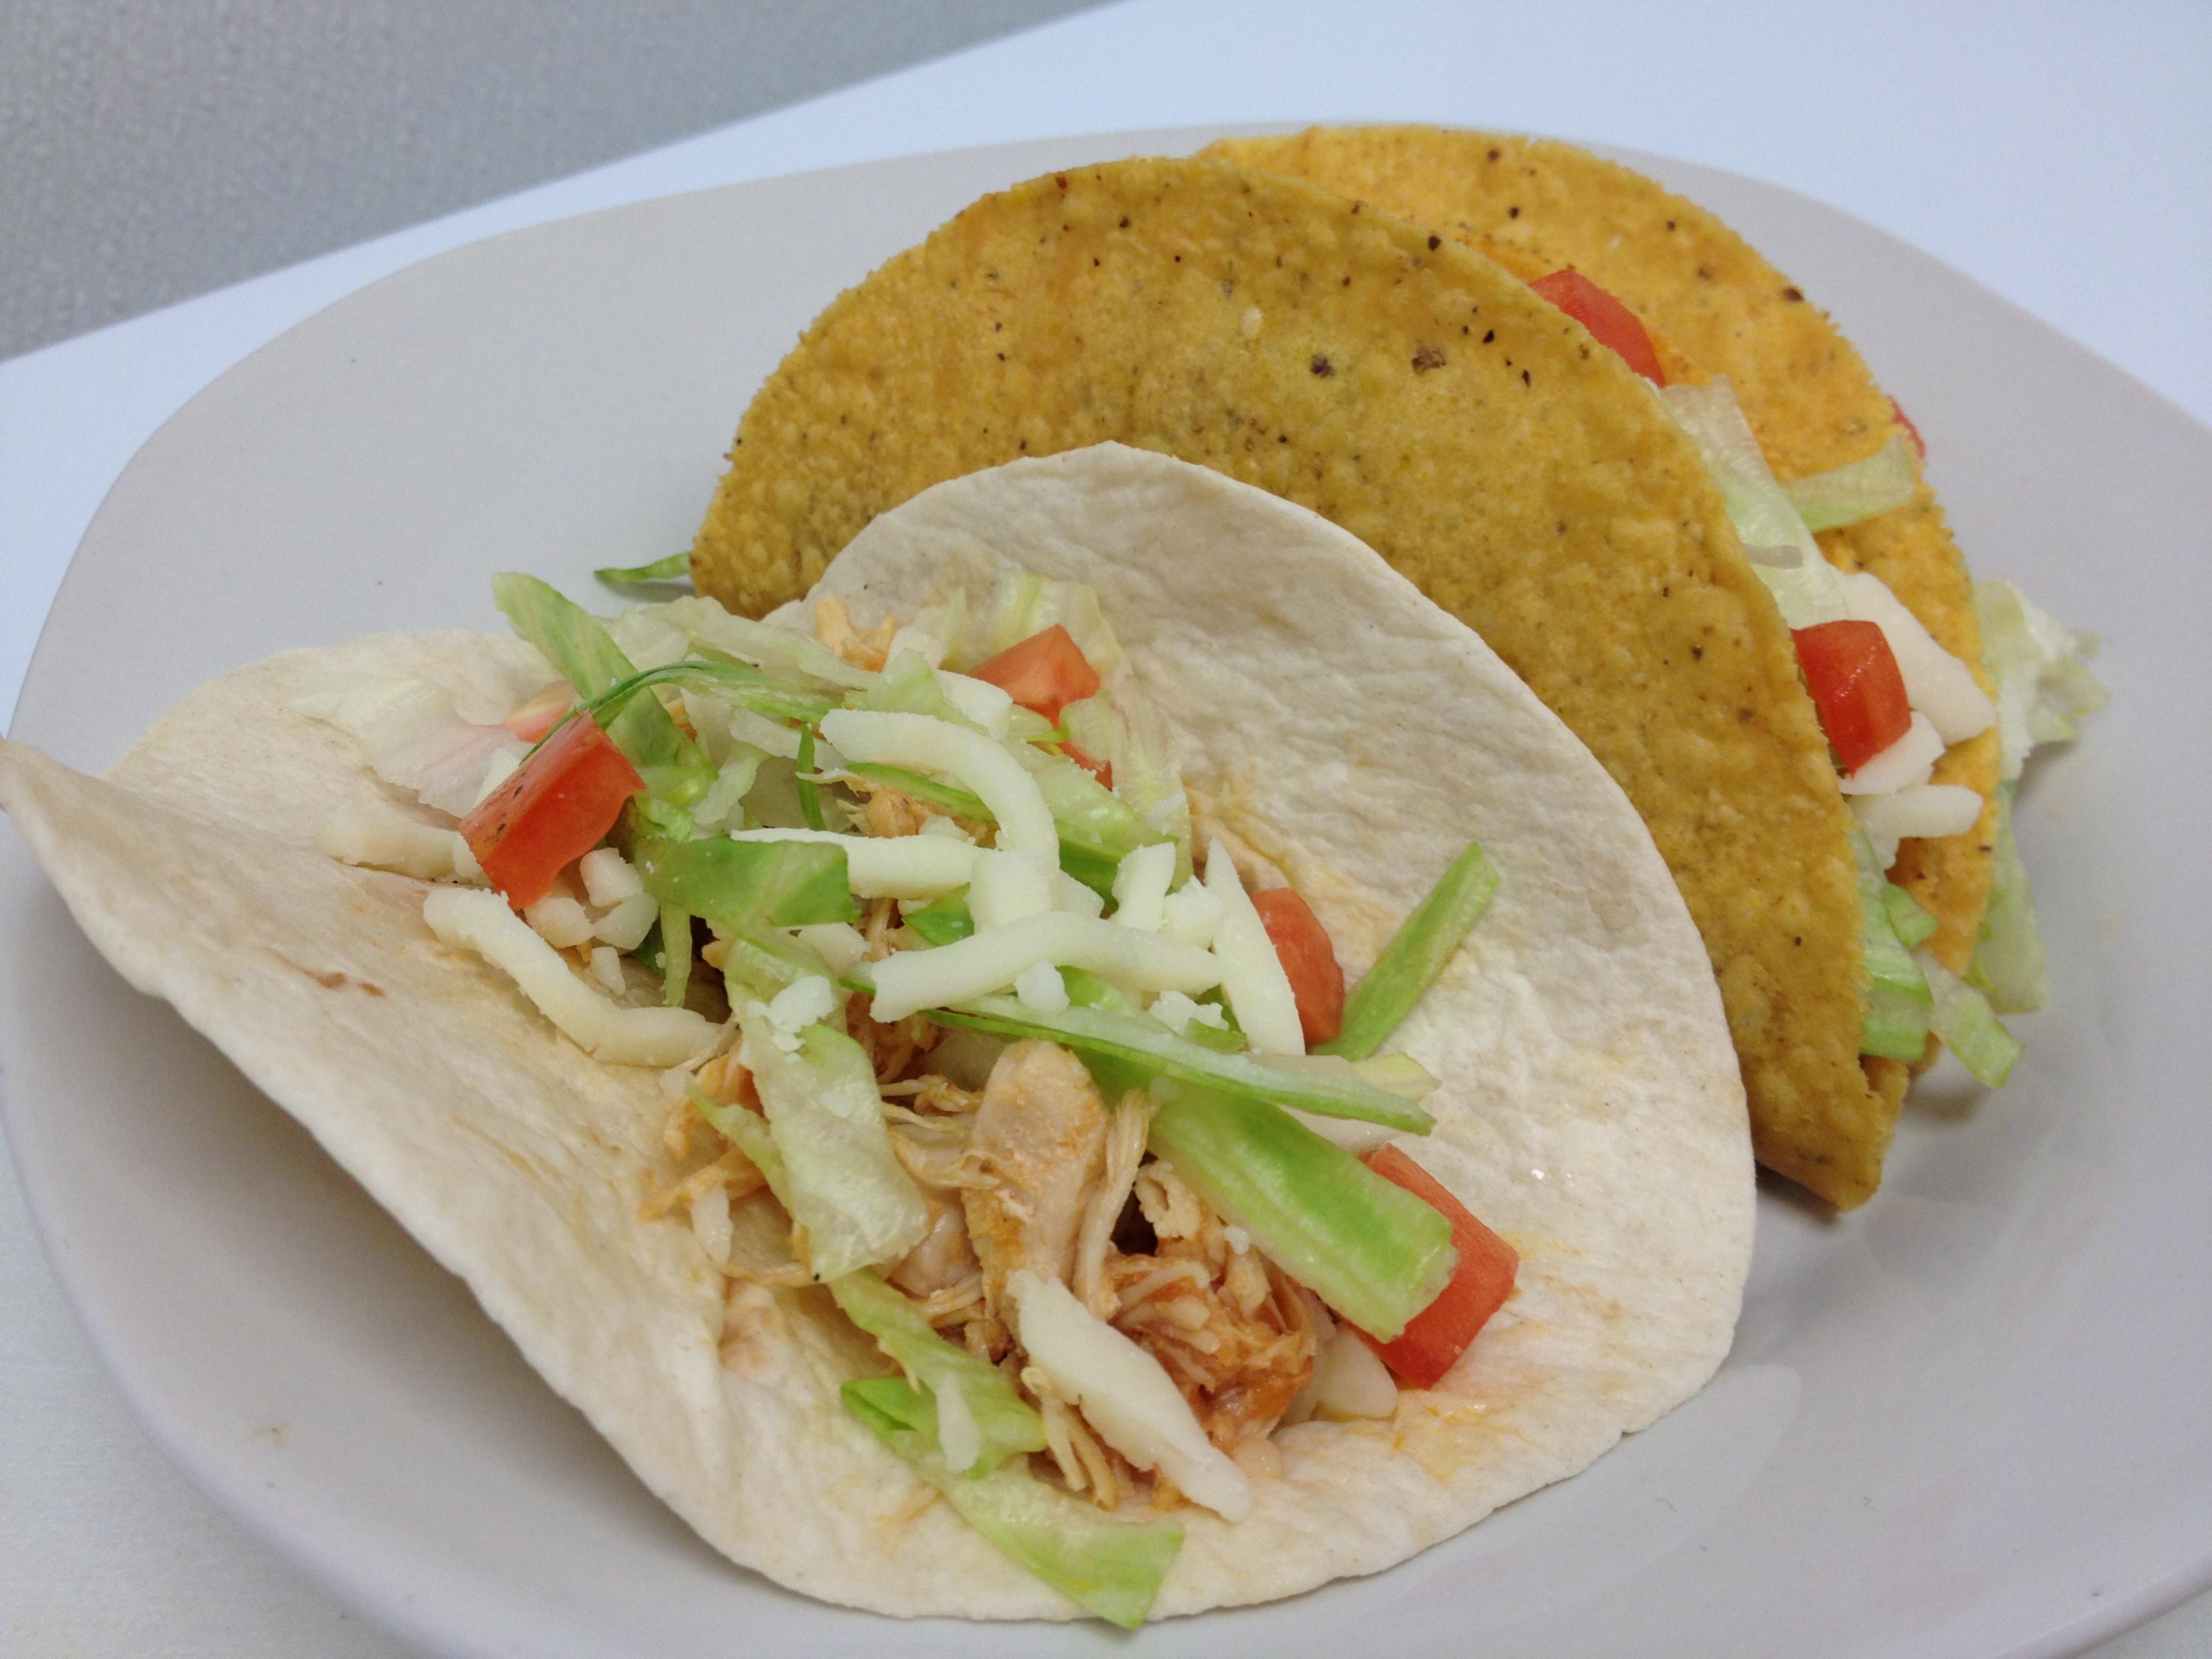 Tacos Order (2) Soft Or Hard Tortilla